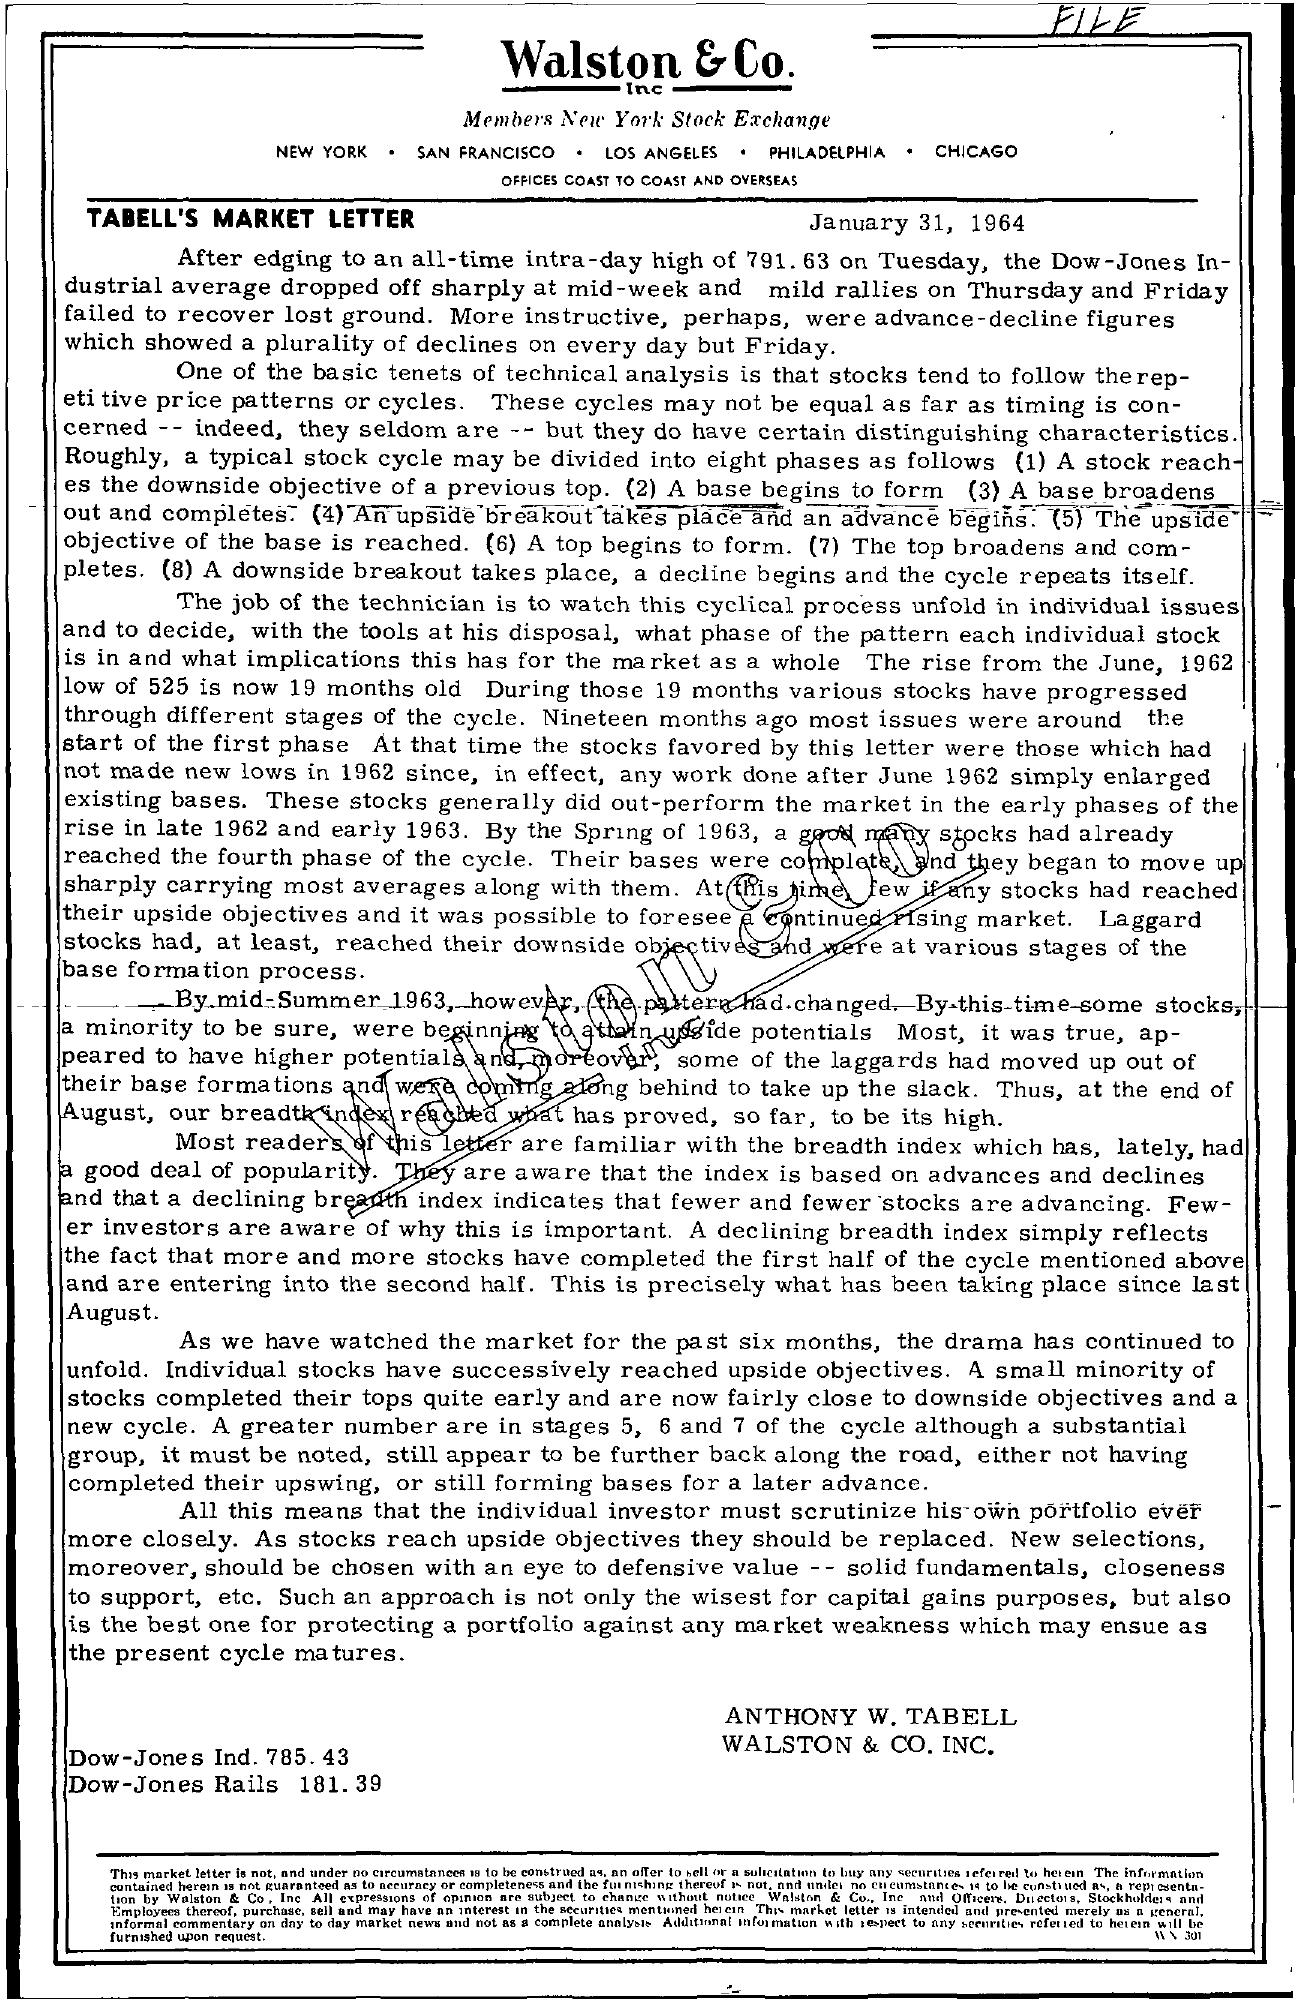 Tabell's Market Letter - January 31, 1964